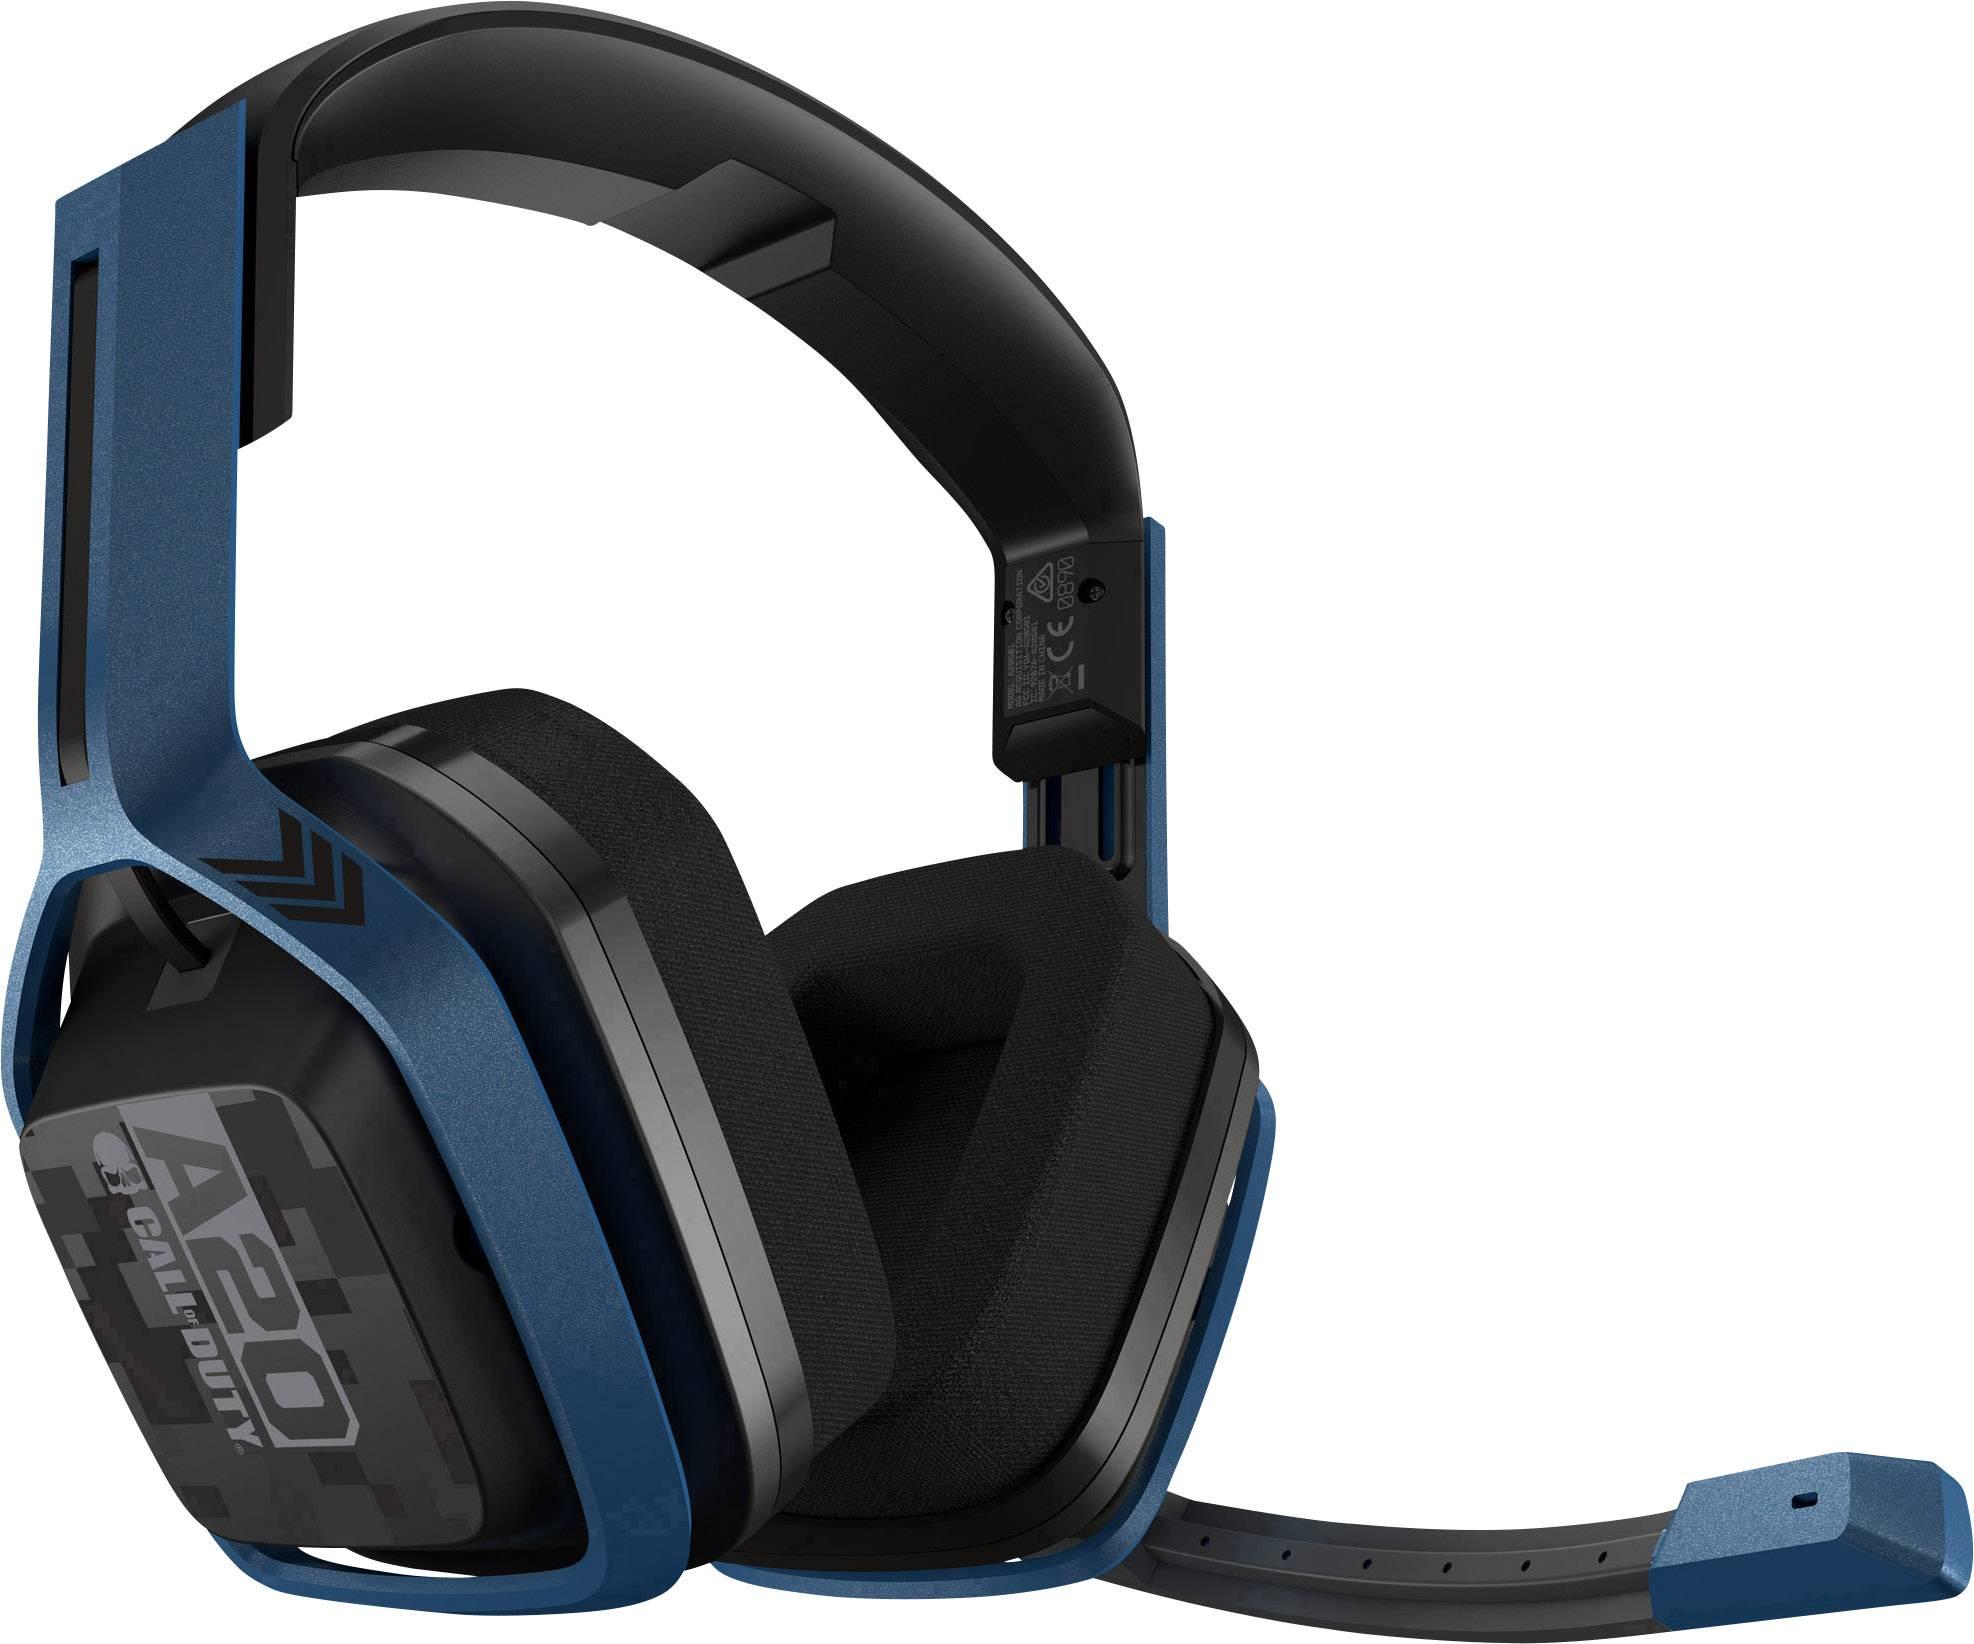 Astro A20 Wireless Call Of Duty Cuffia Headset per Gaming 5 GHz, USB Cuffia Over Ear Navy-Blu